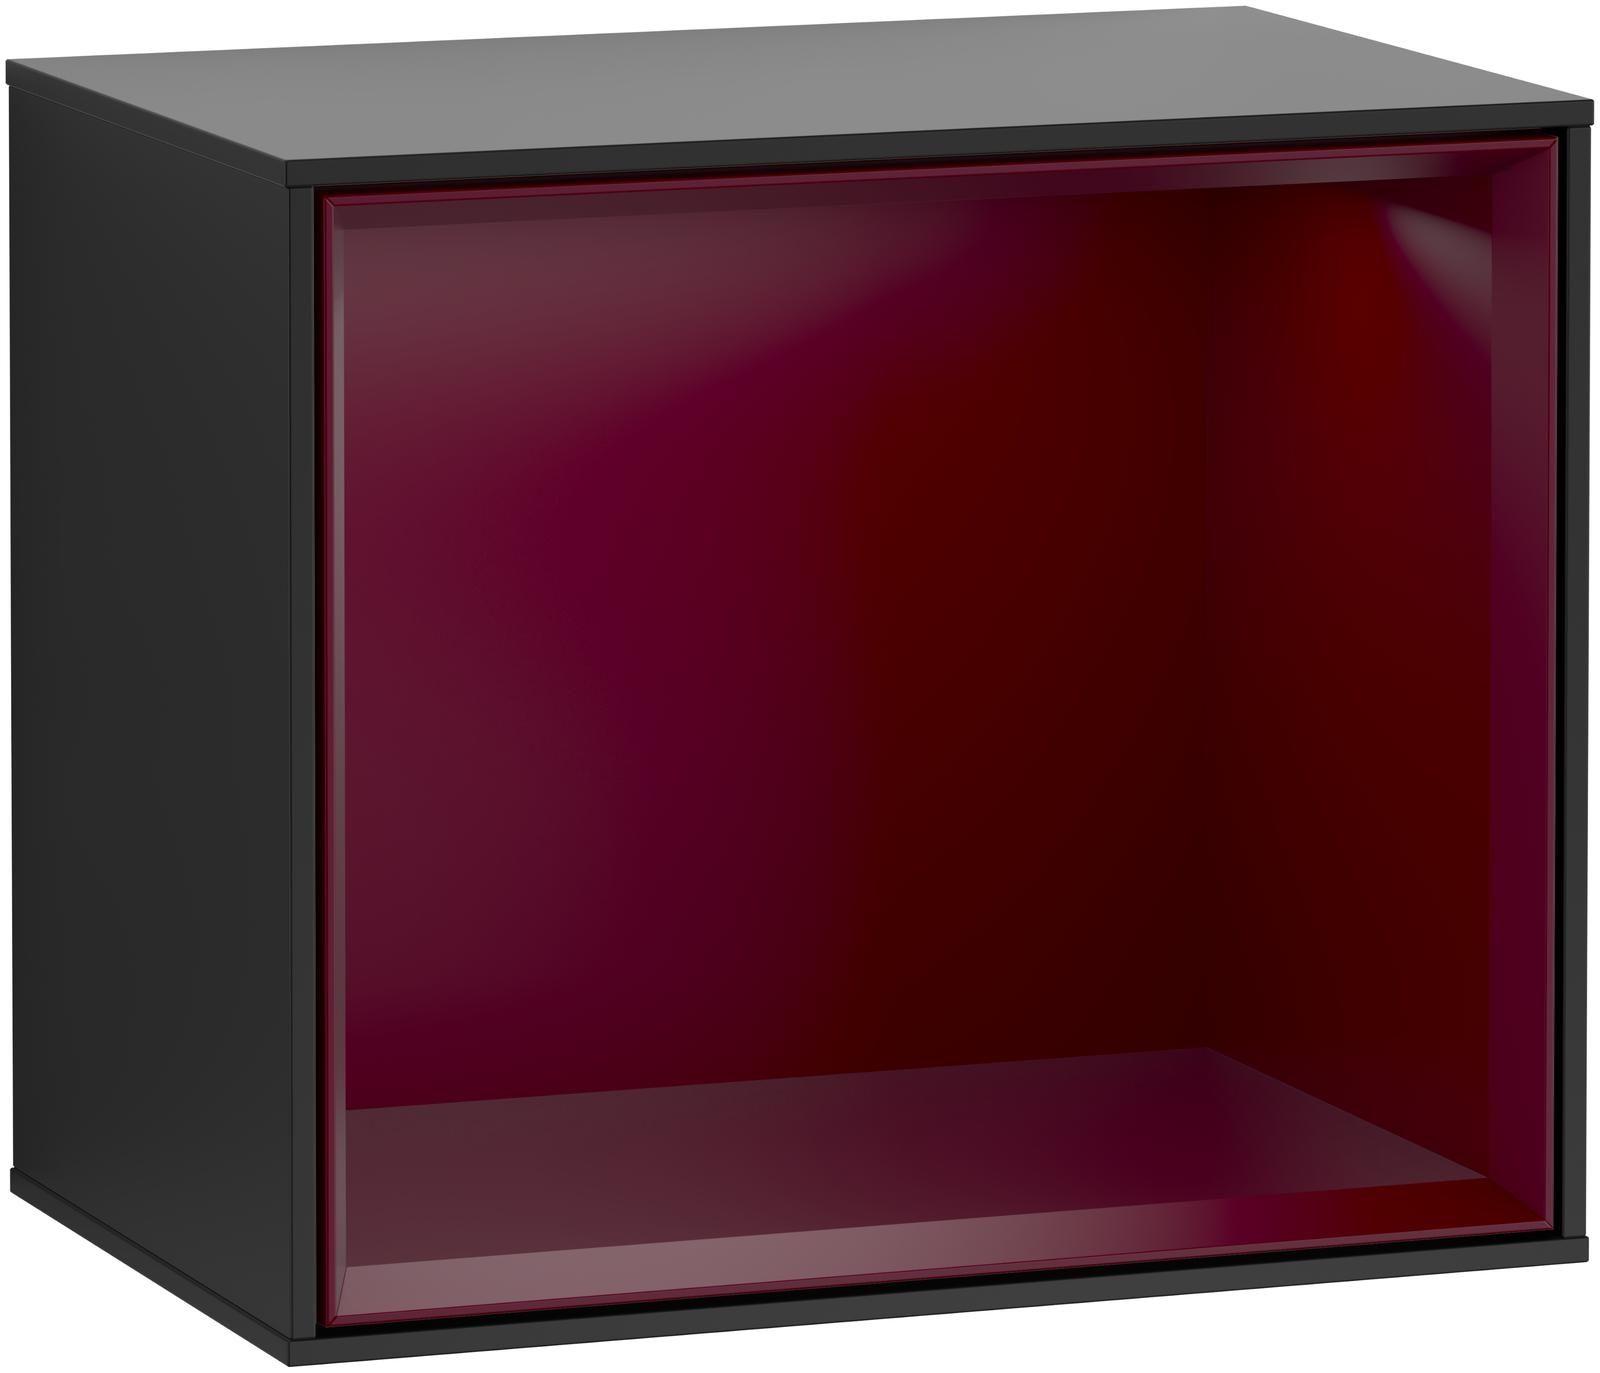 Villeroy & Boch Finion G58 Regalmodul LED-Beleuchtung B:41,8xH:35,6xT:27cm Front, Korpus: Black Matt Lacquer, Regal: Peony G580HBPD